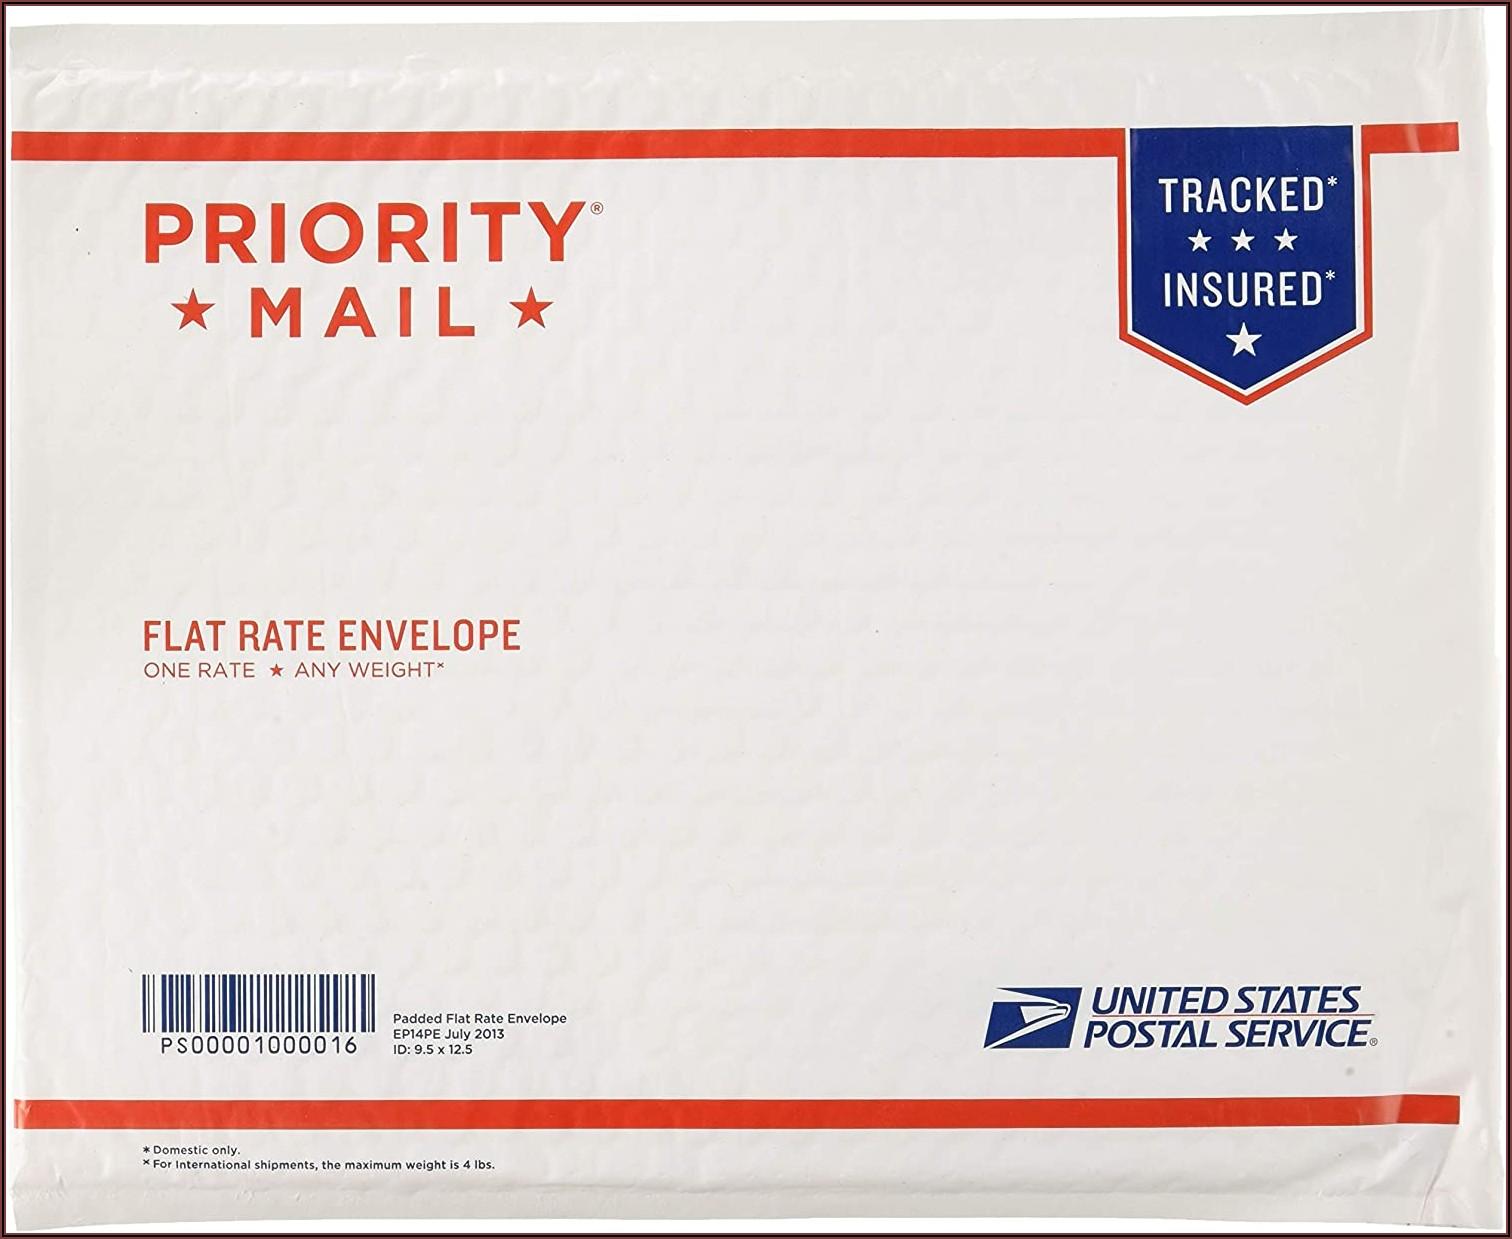 Usps Priority Mailing Envelope Sizes